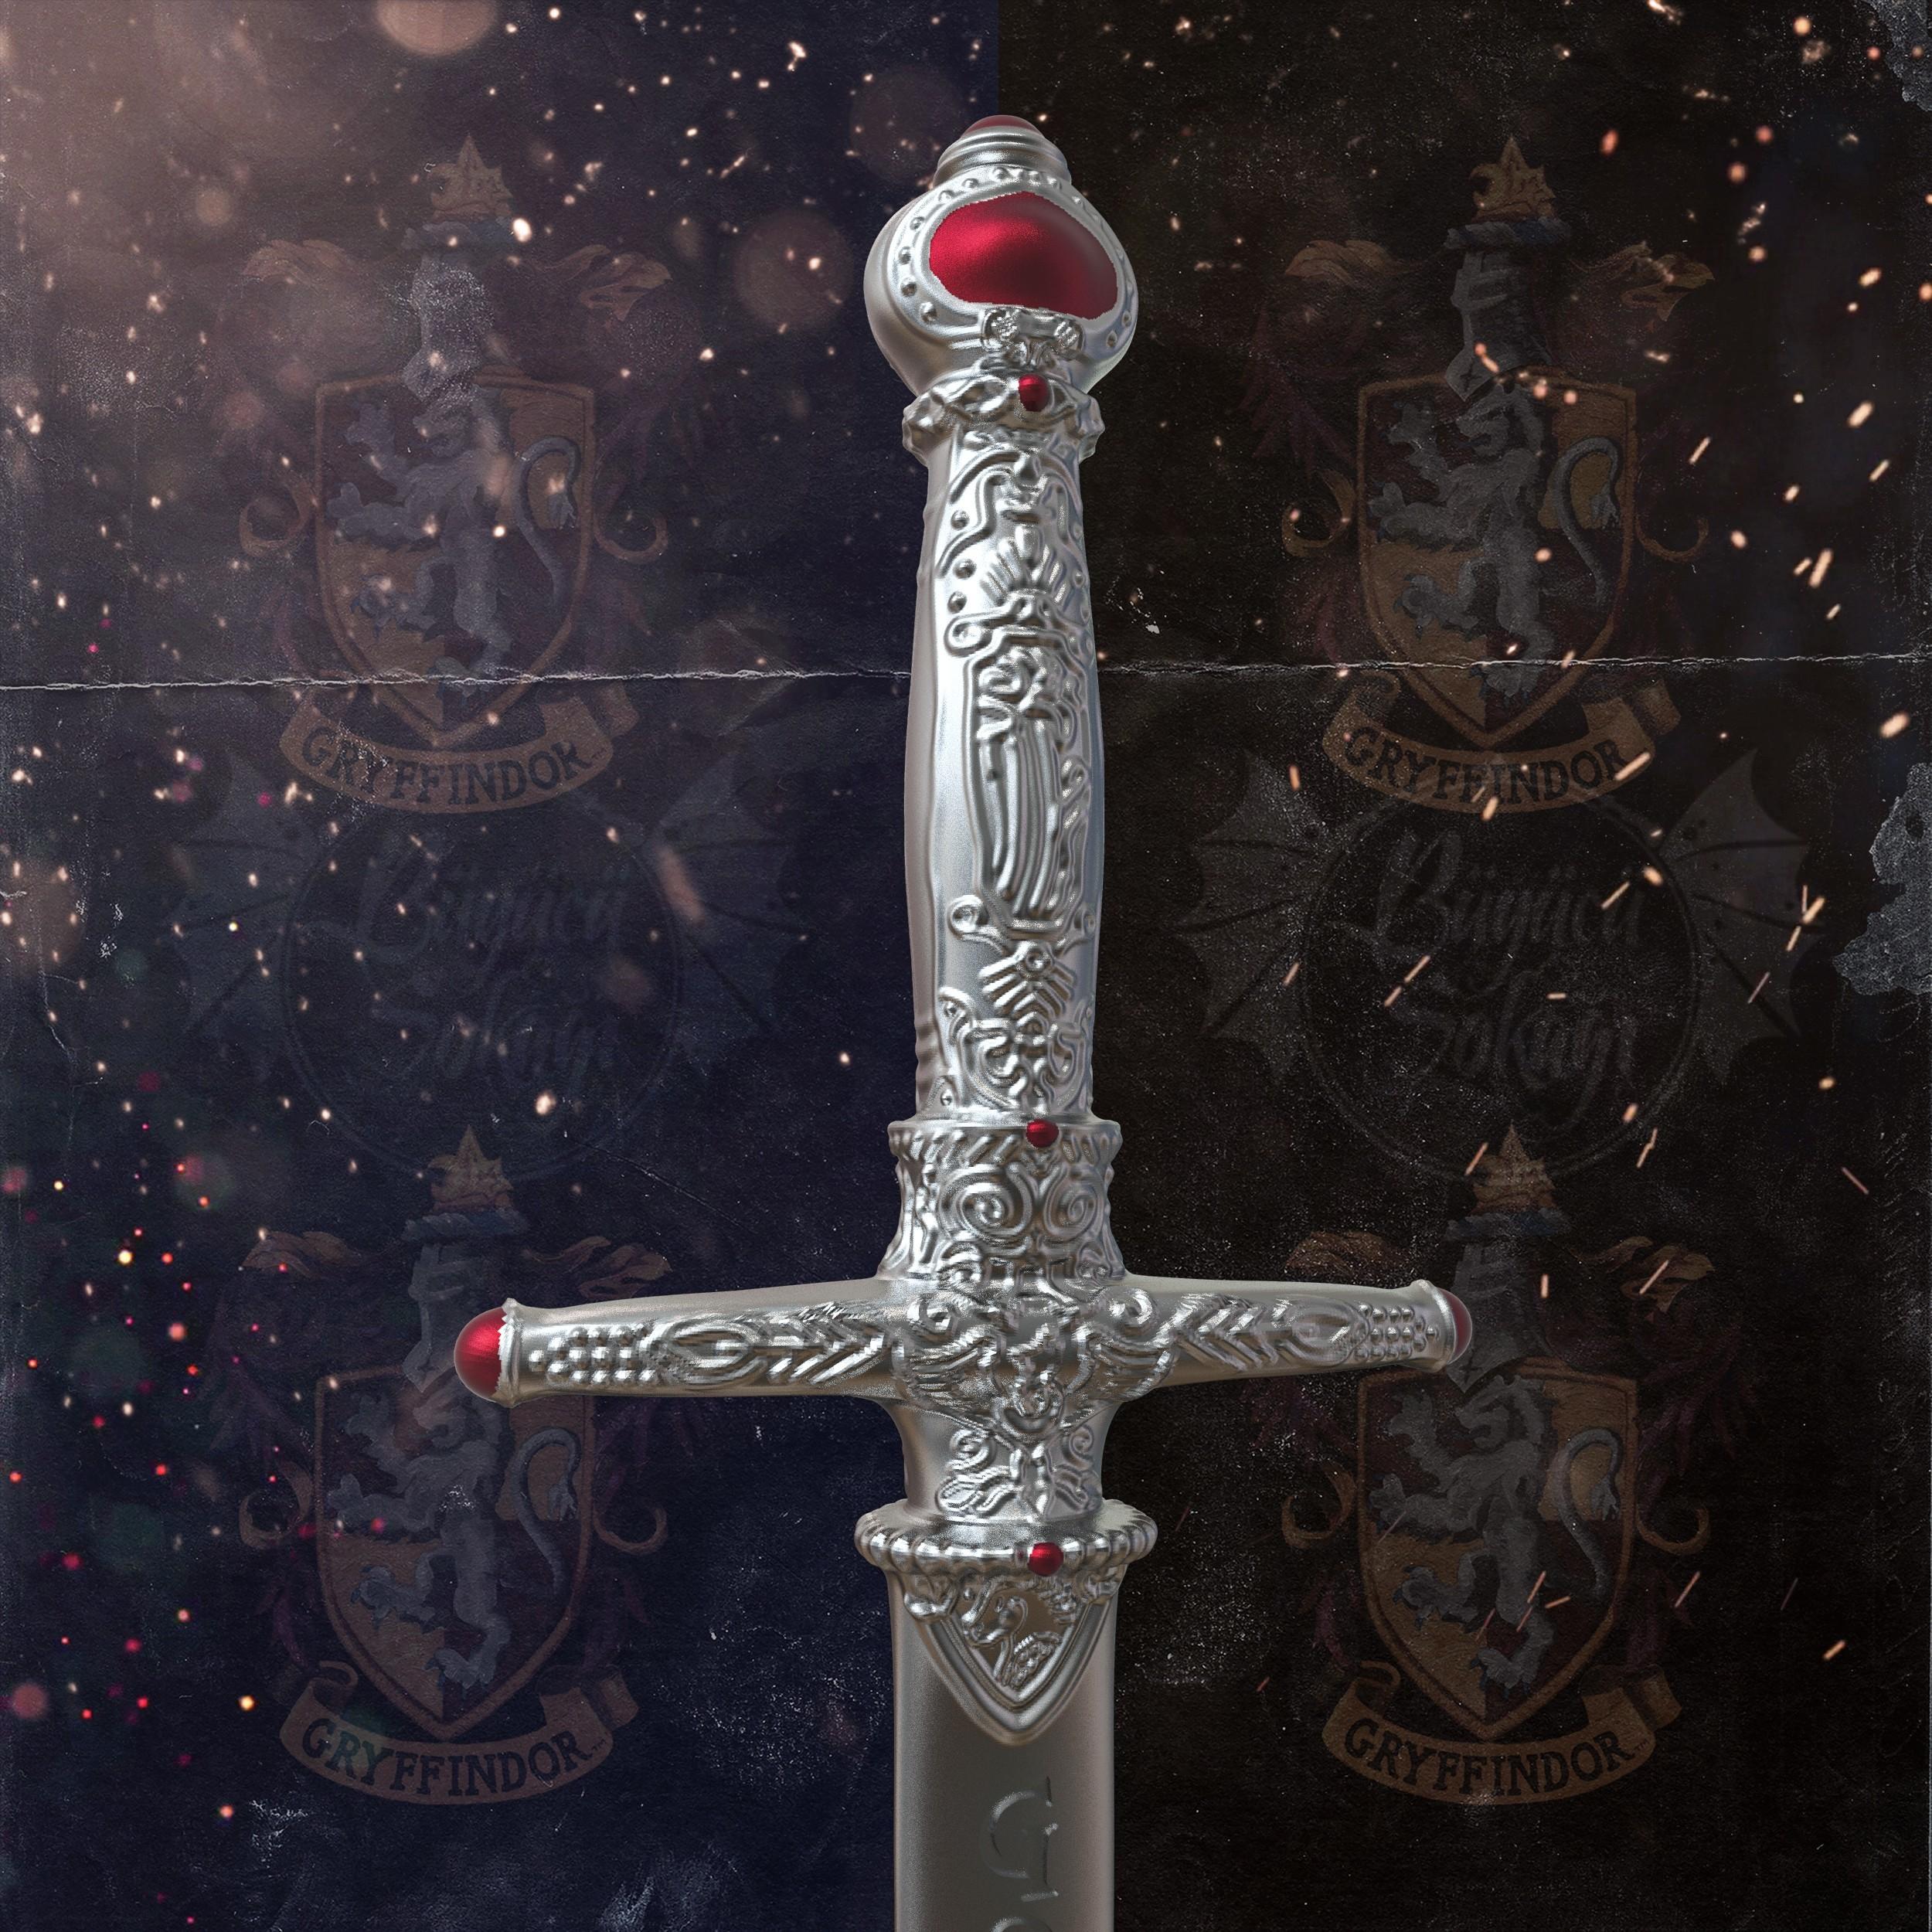 1.jpg Download STL file Godric Gryffindor's Sword - Harry Potter • 3D printing template, tolgaaxu